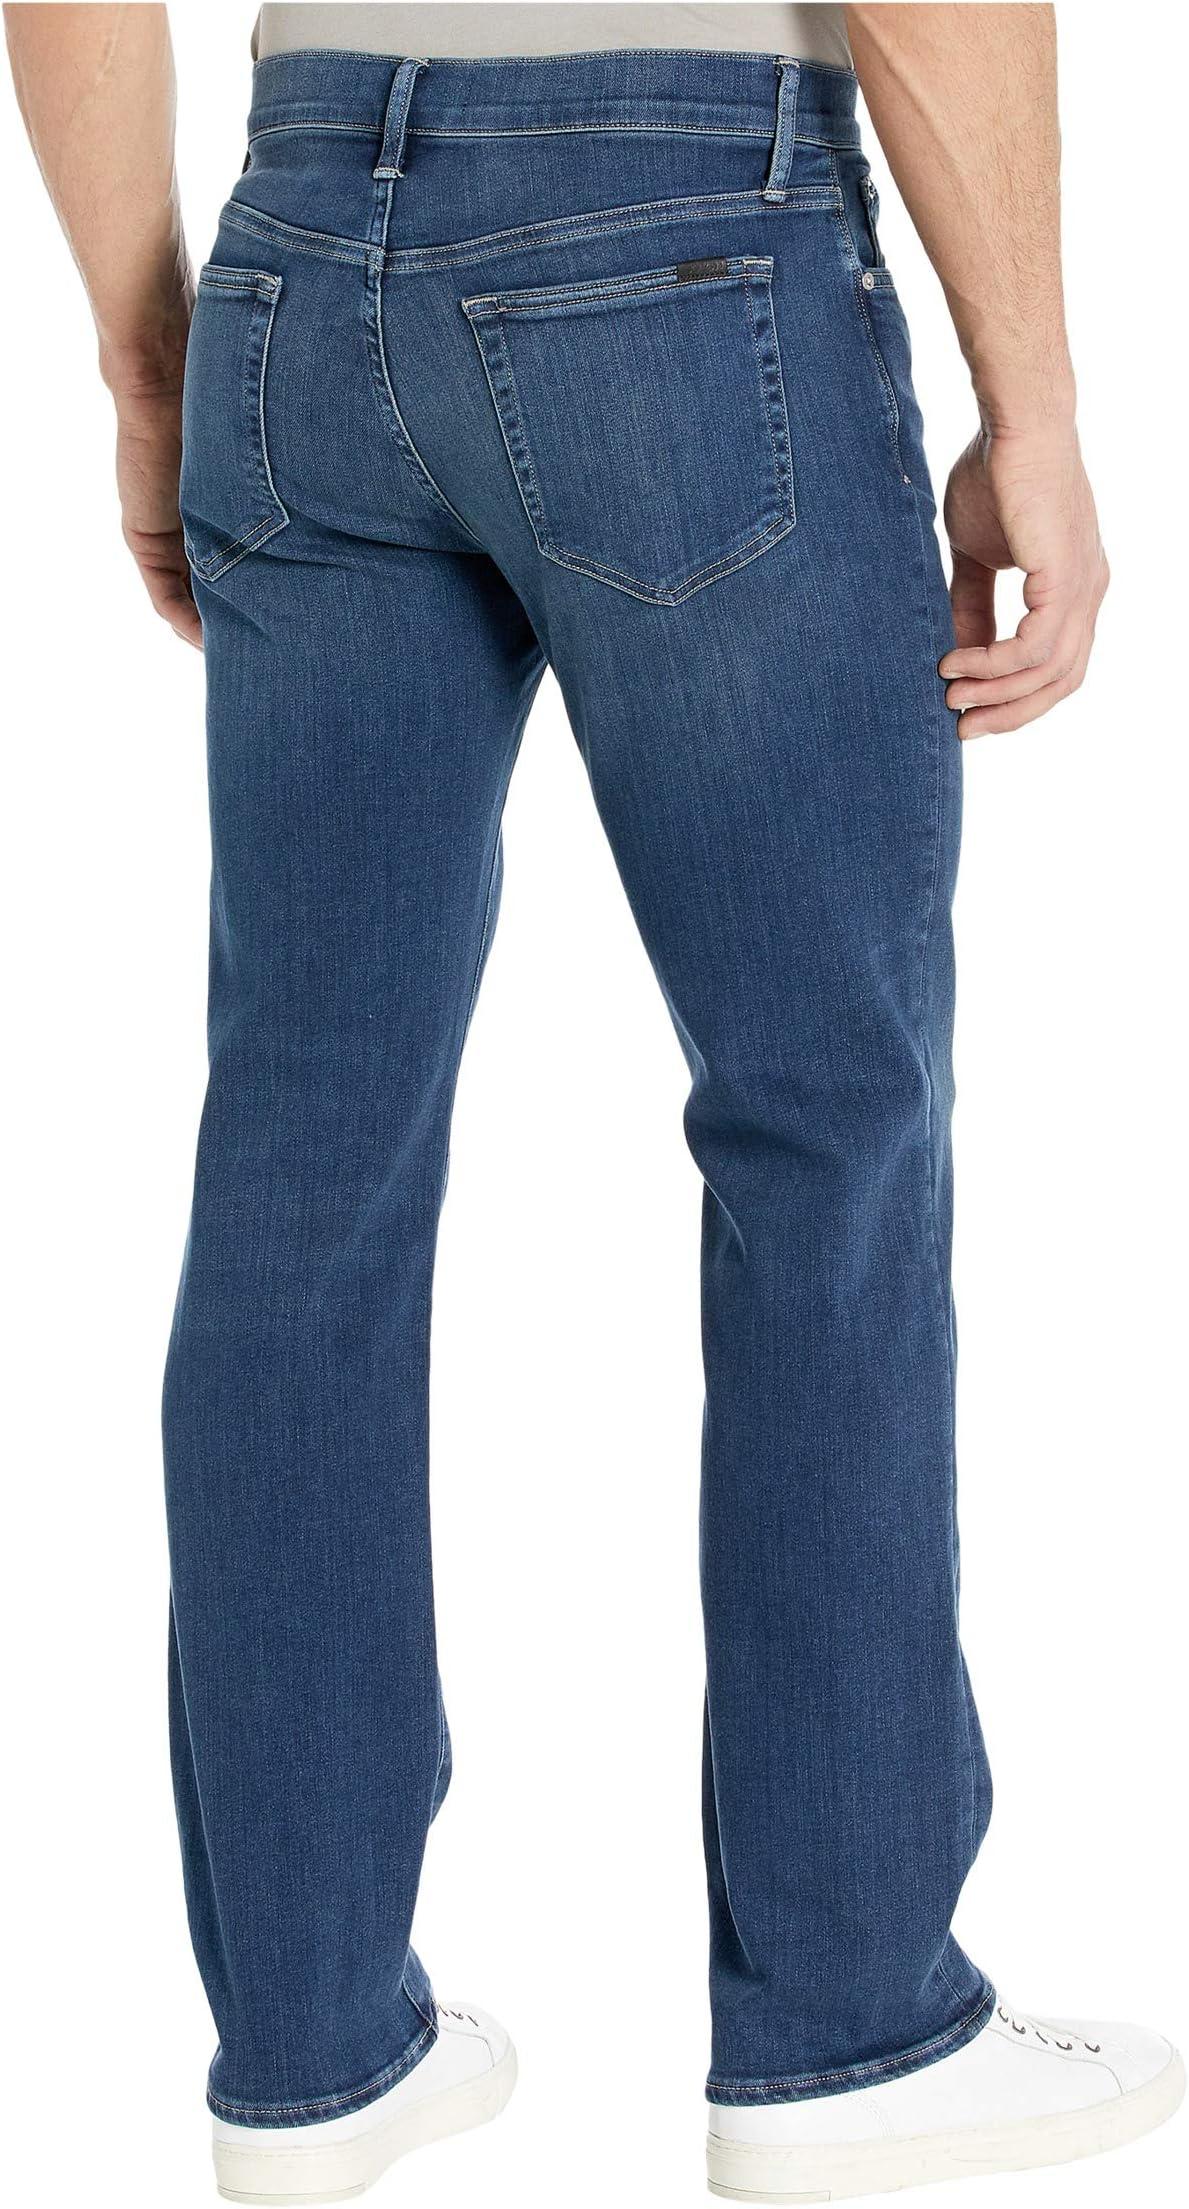 Joe's Jeans Classic Straight Leg in Crick jTjua